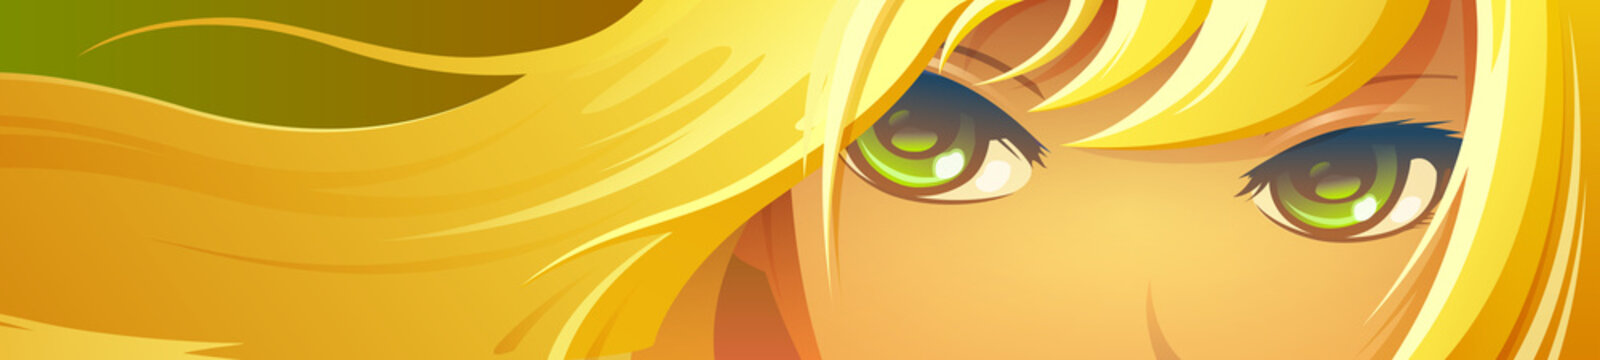 Girl face with green eyes. Cartoon anime style.